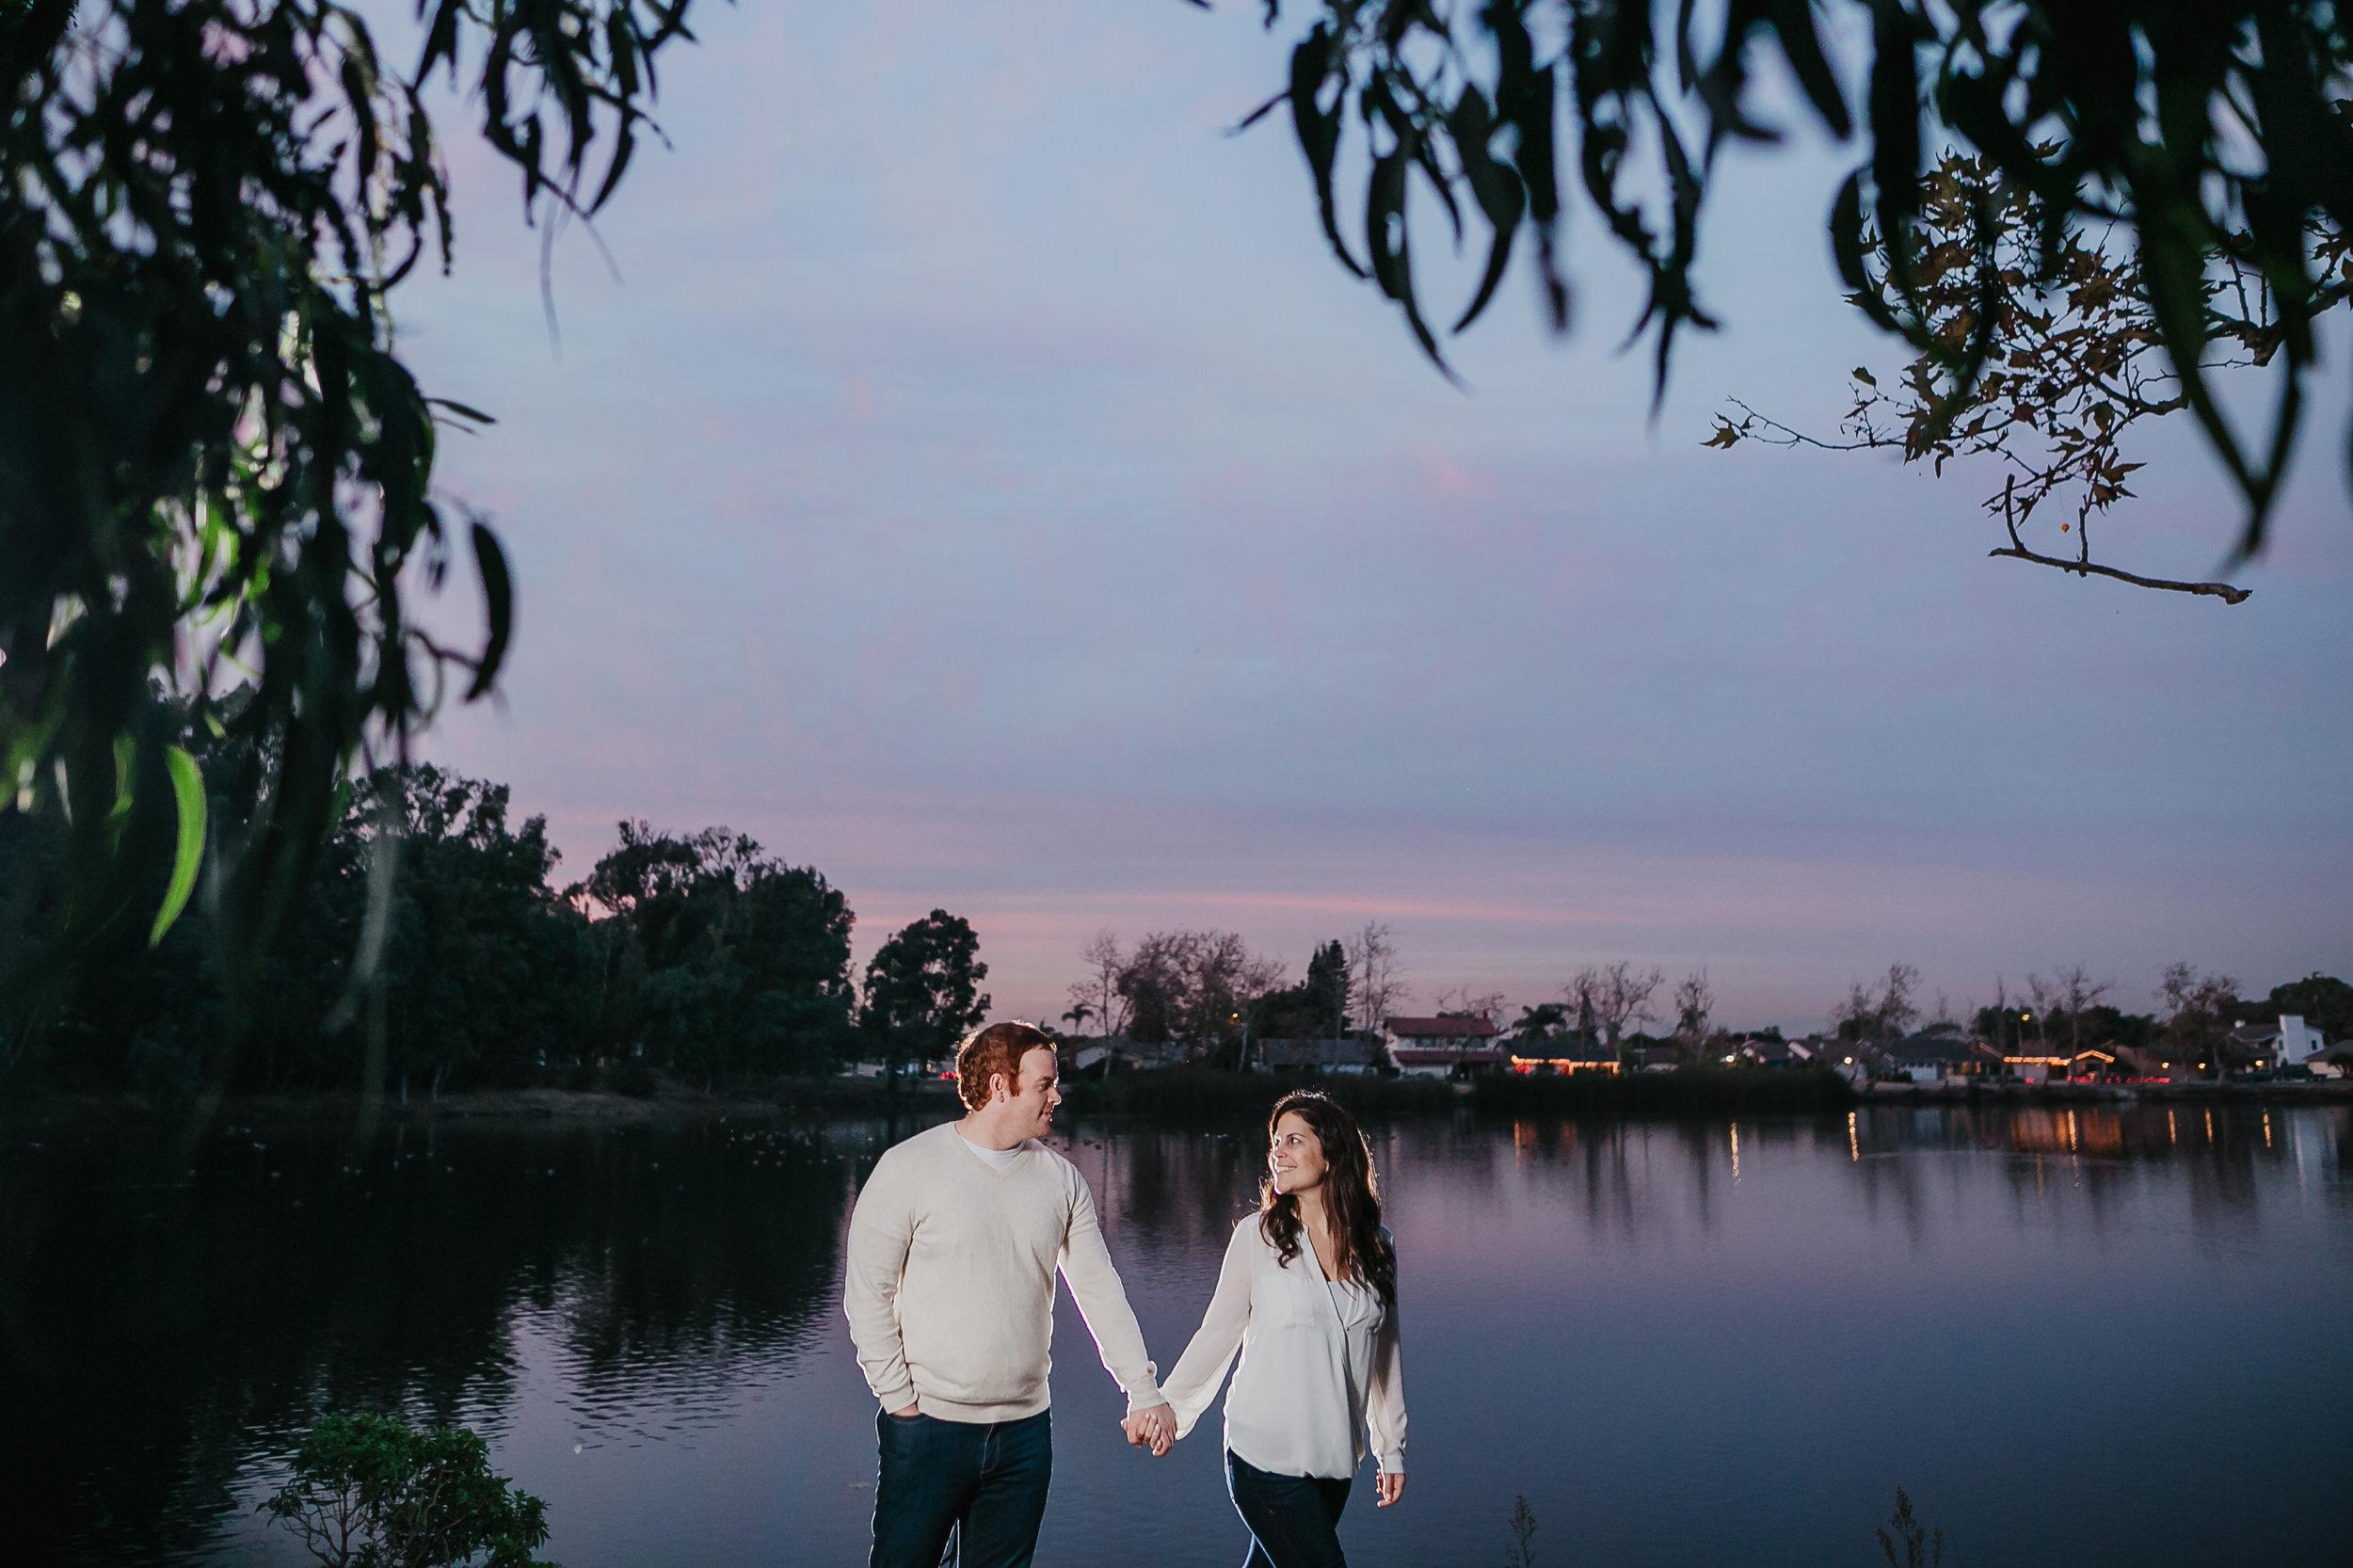 AM-Huntington-Central-Park-Engagement-Photography 152.jpg